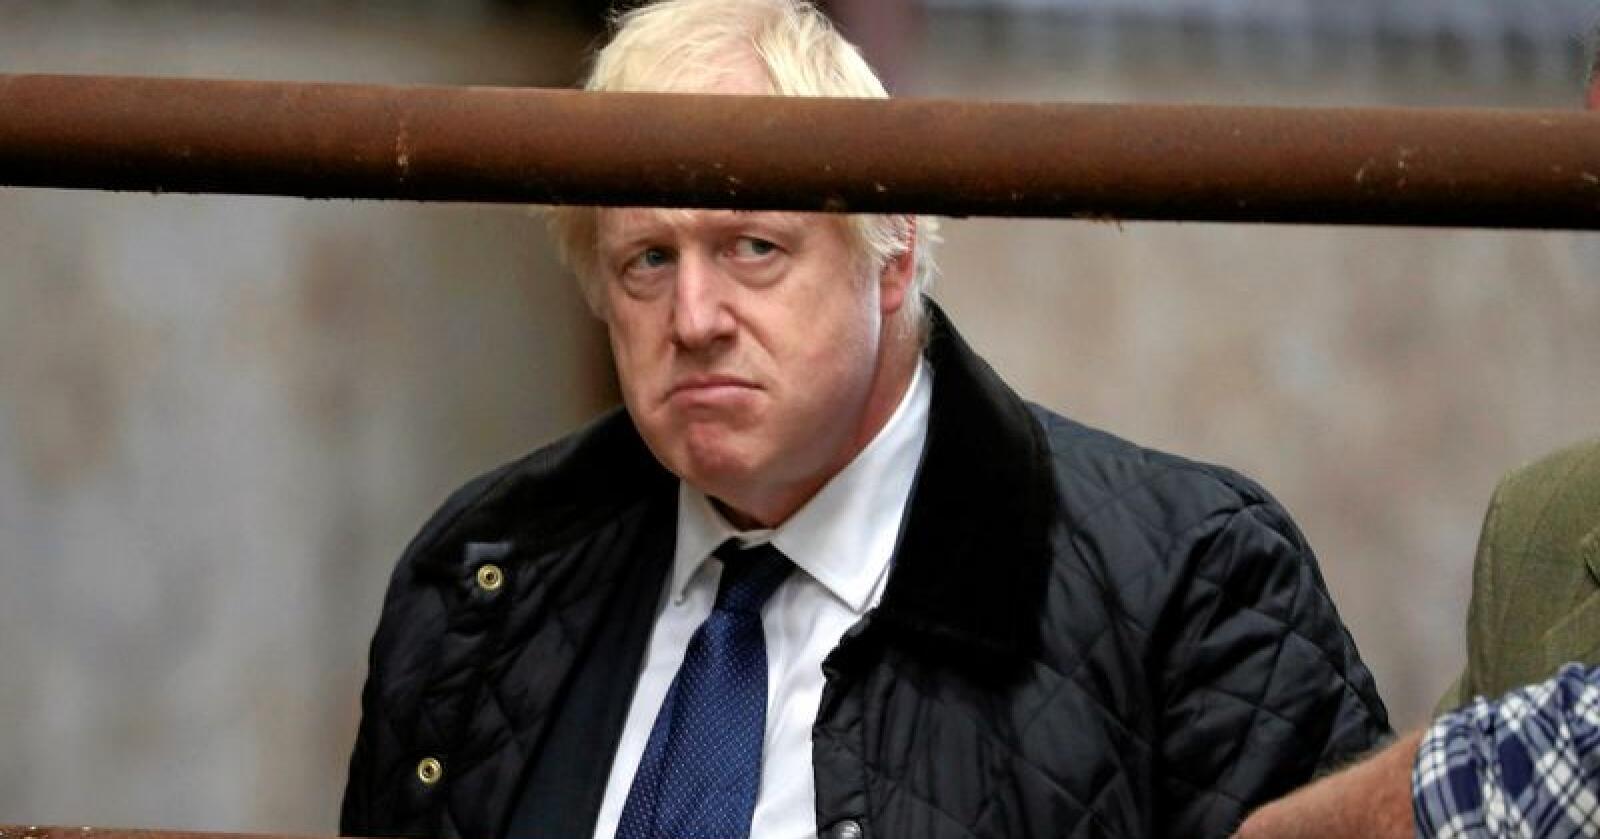 Boris Johnson. Foto: Andrew Milligan / PA via AP / NTB Scanpix